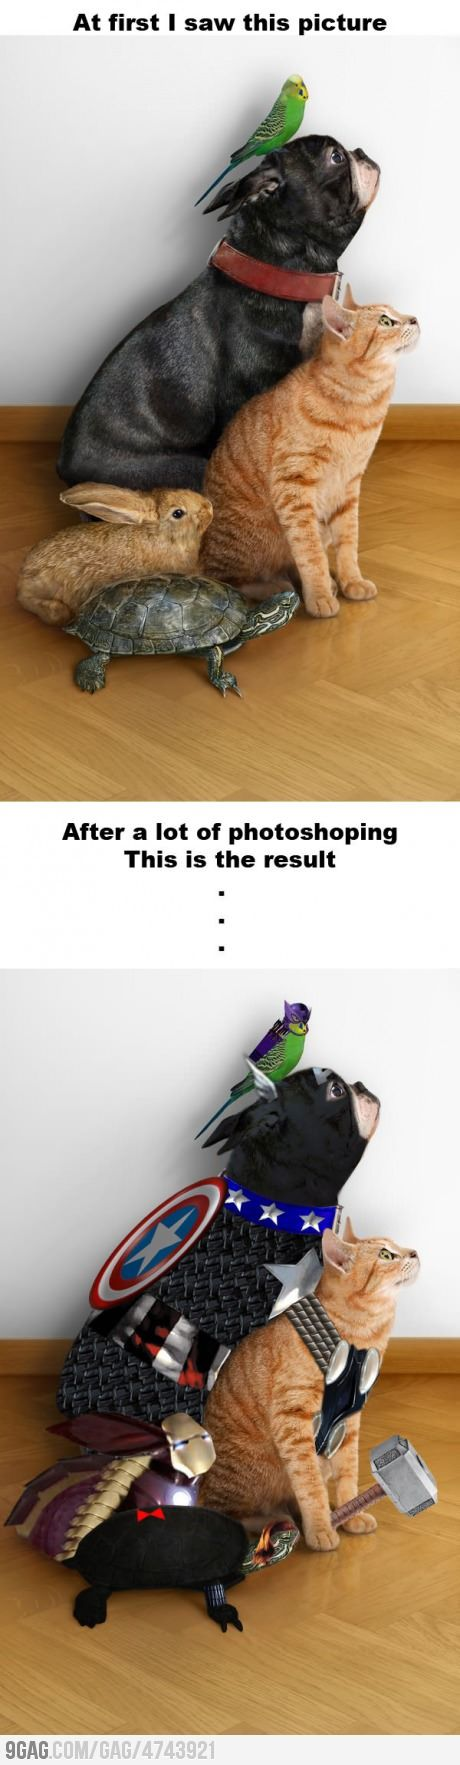 best animals that make you wonder images on pinterest